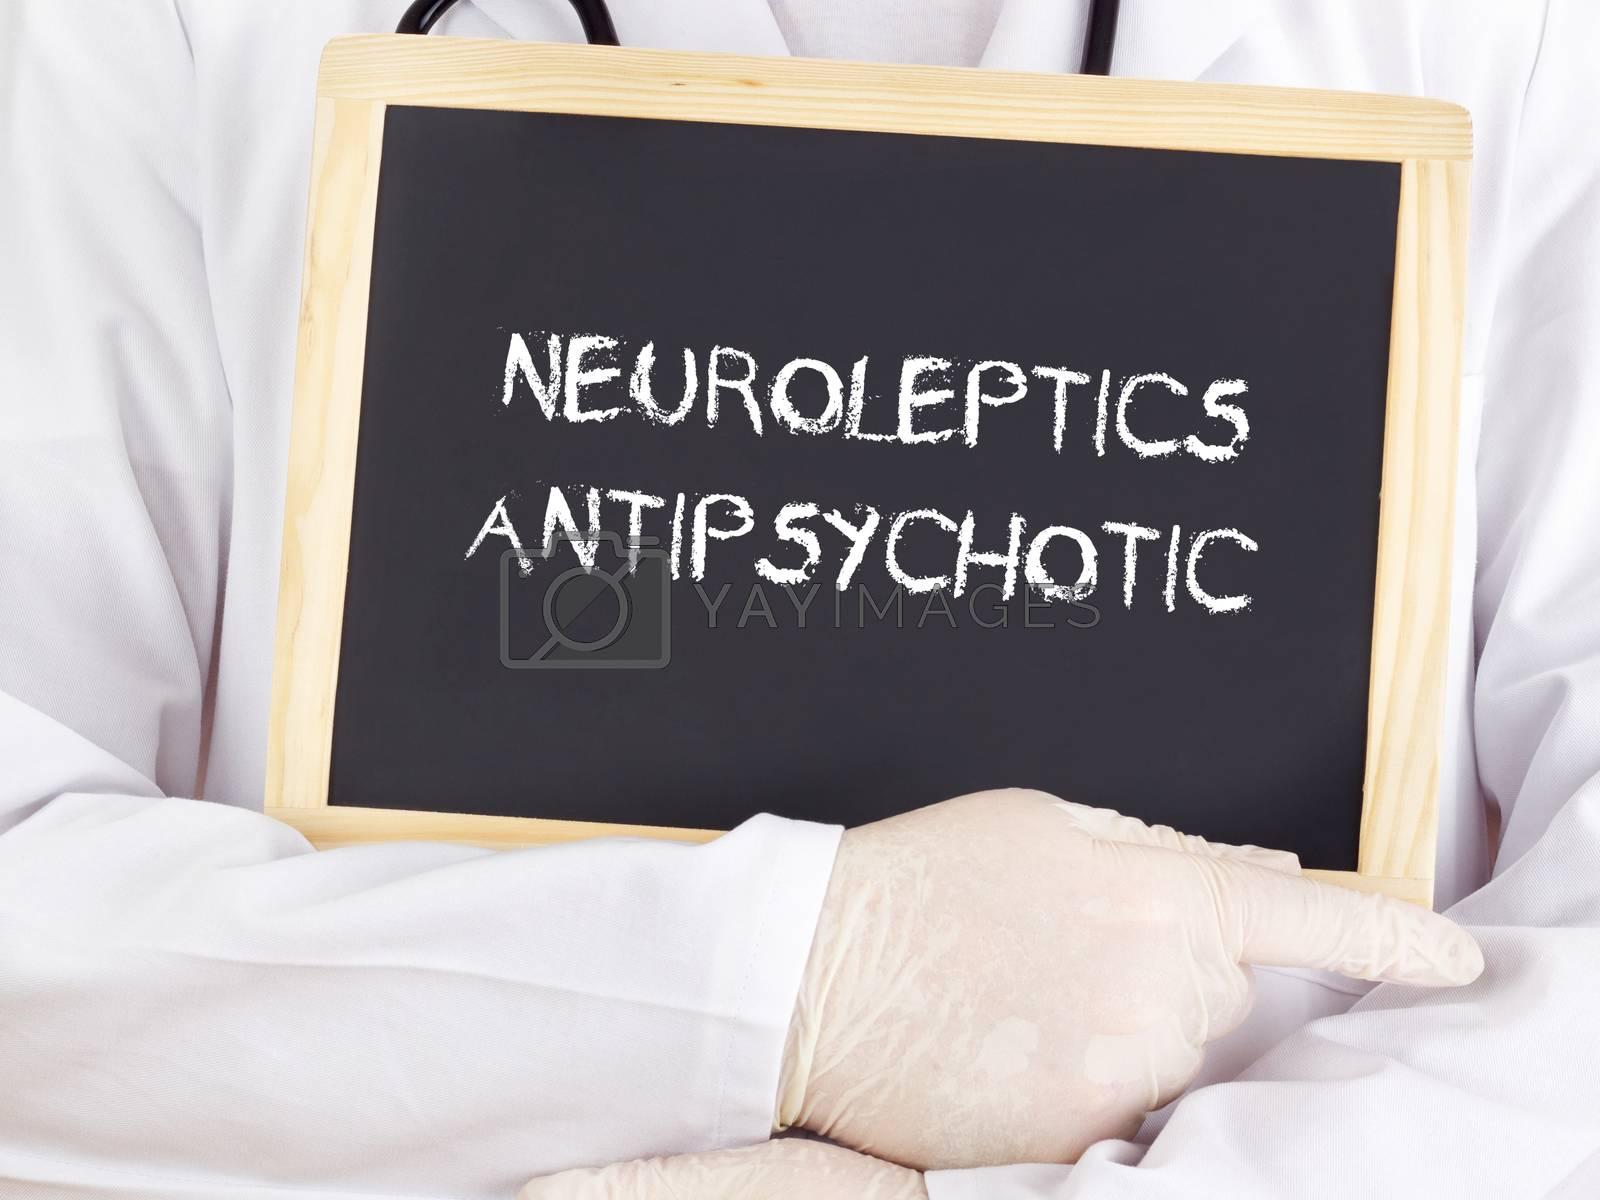 Doctor shows information: neuroleptics antipsychotic